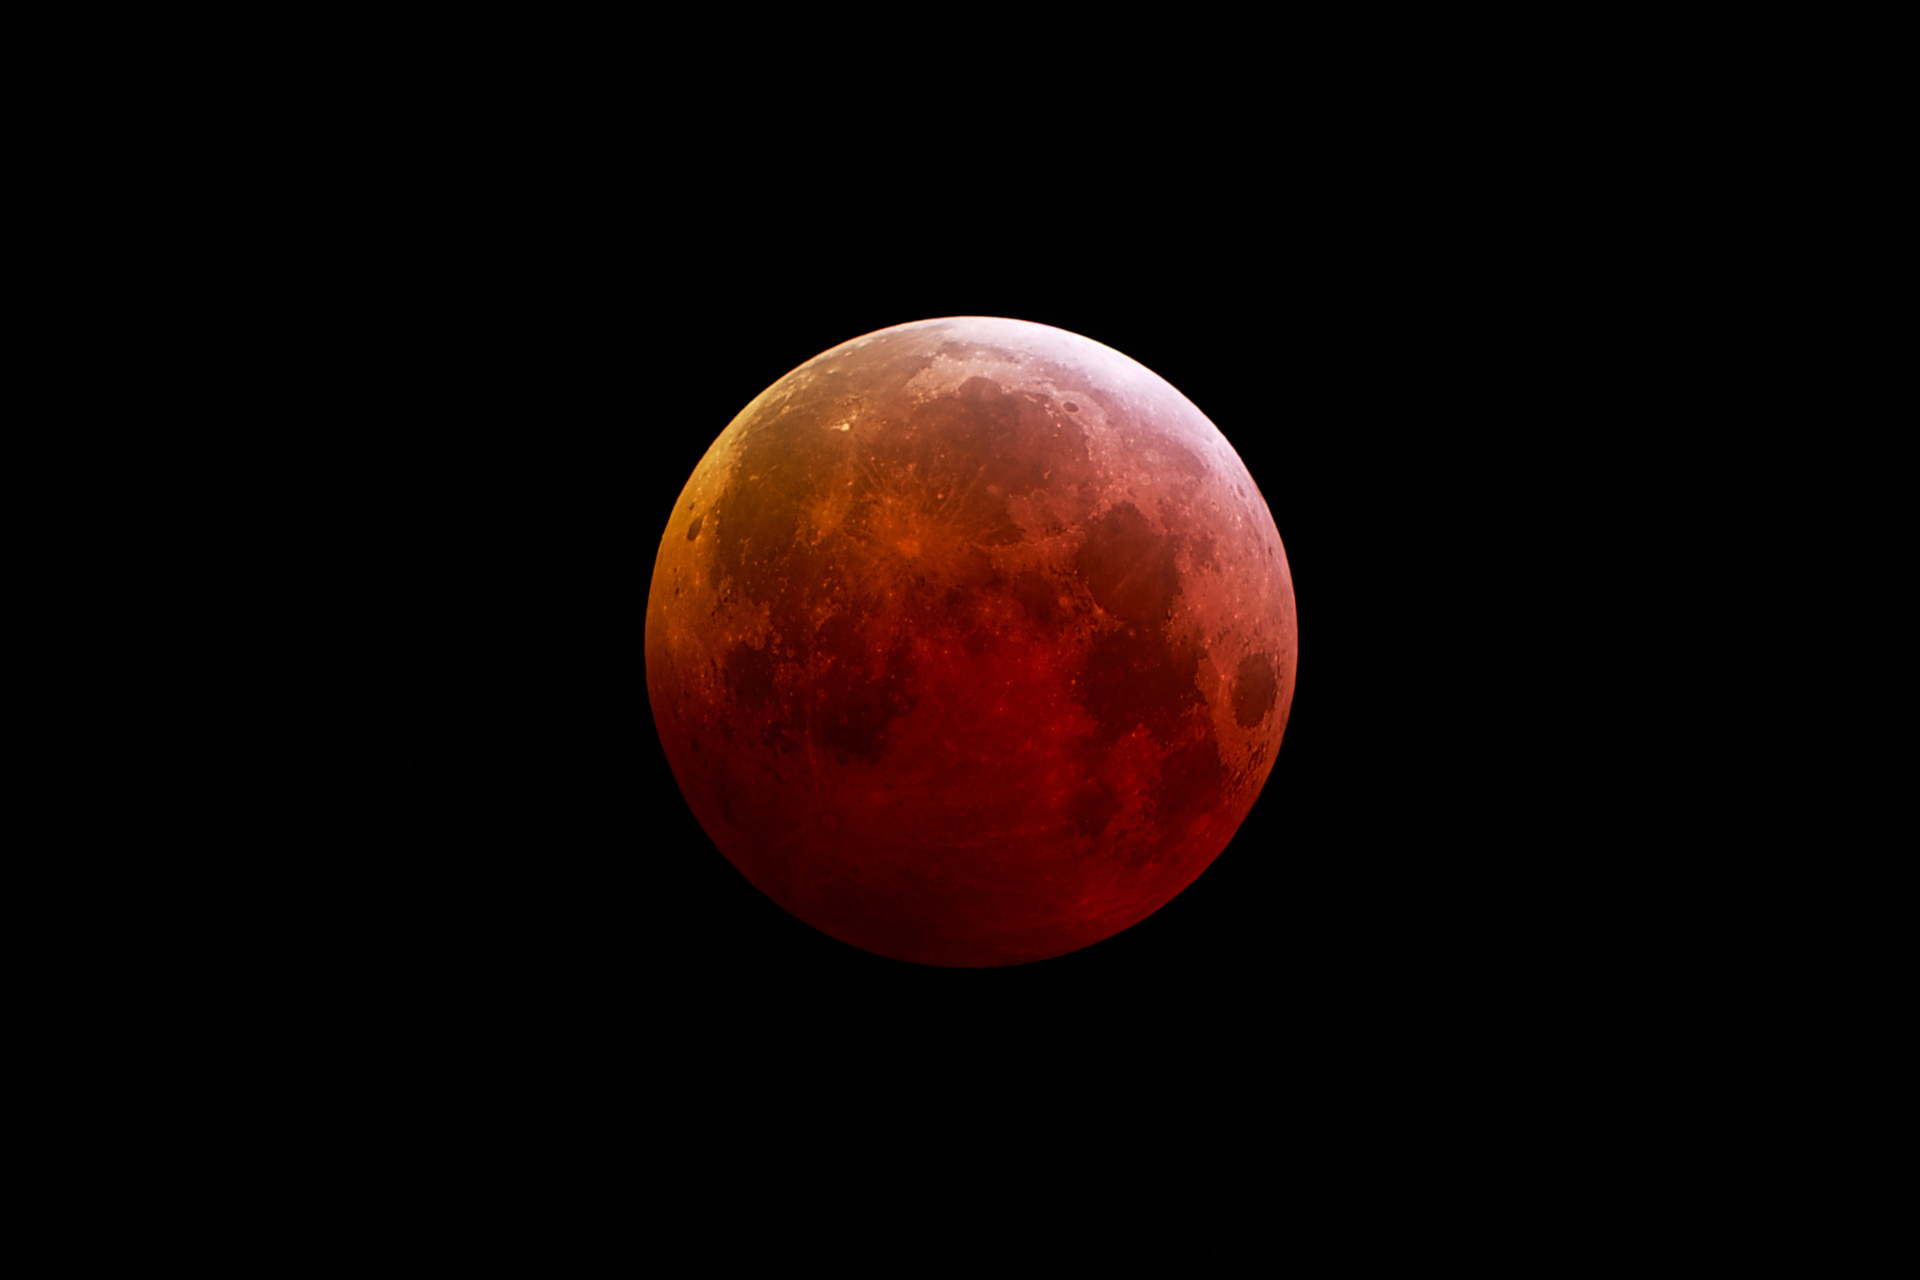 190121 - Eclipse de Lune - Totale - Pollux - STL11K